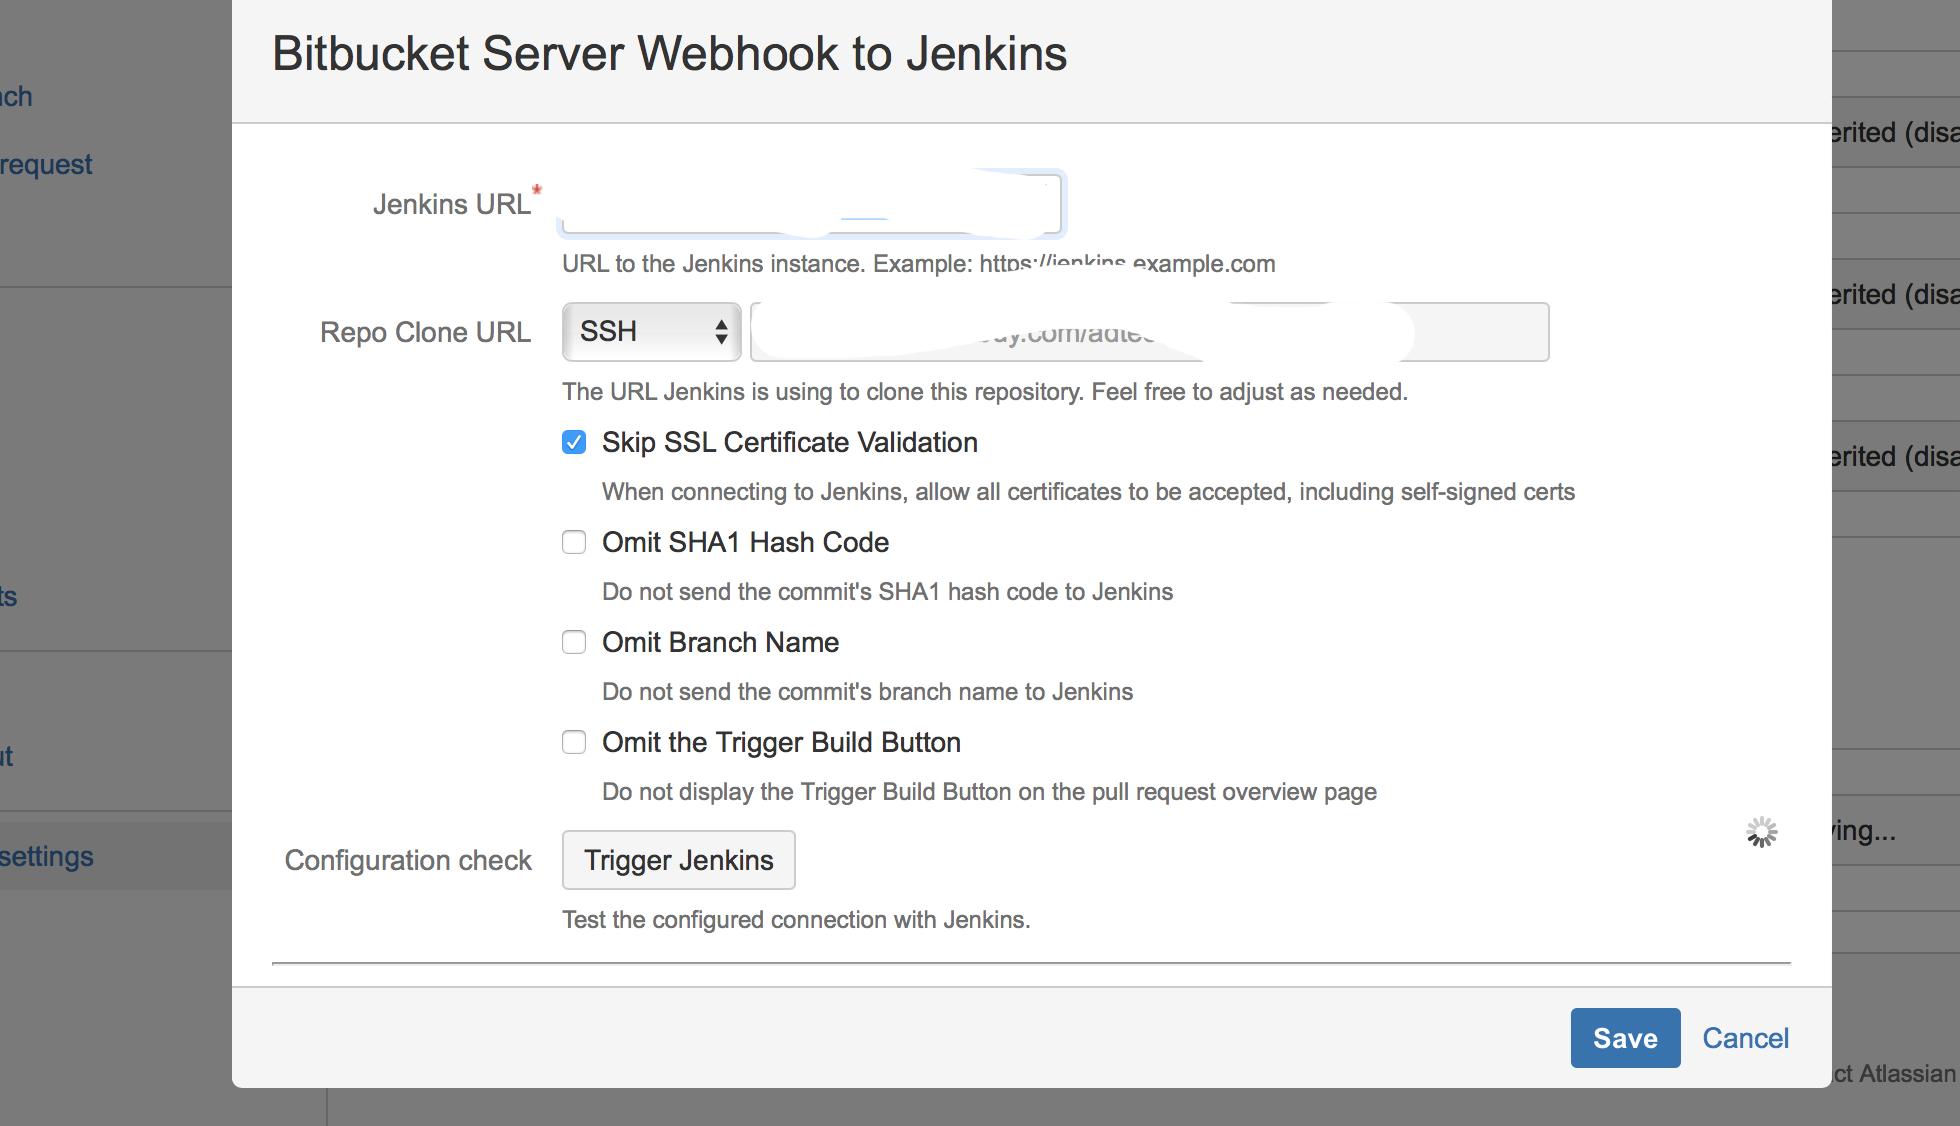 Webhook to Jenkins for Bitbucket Server and Jenkin